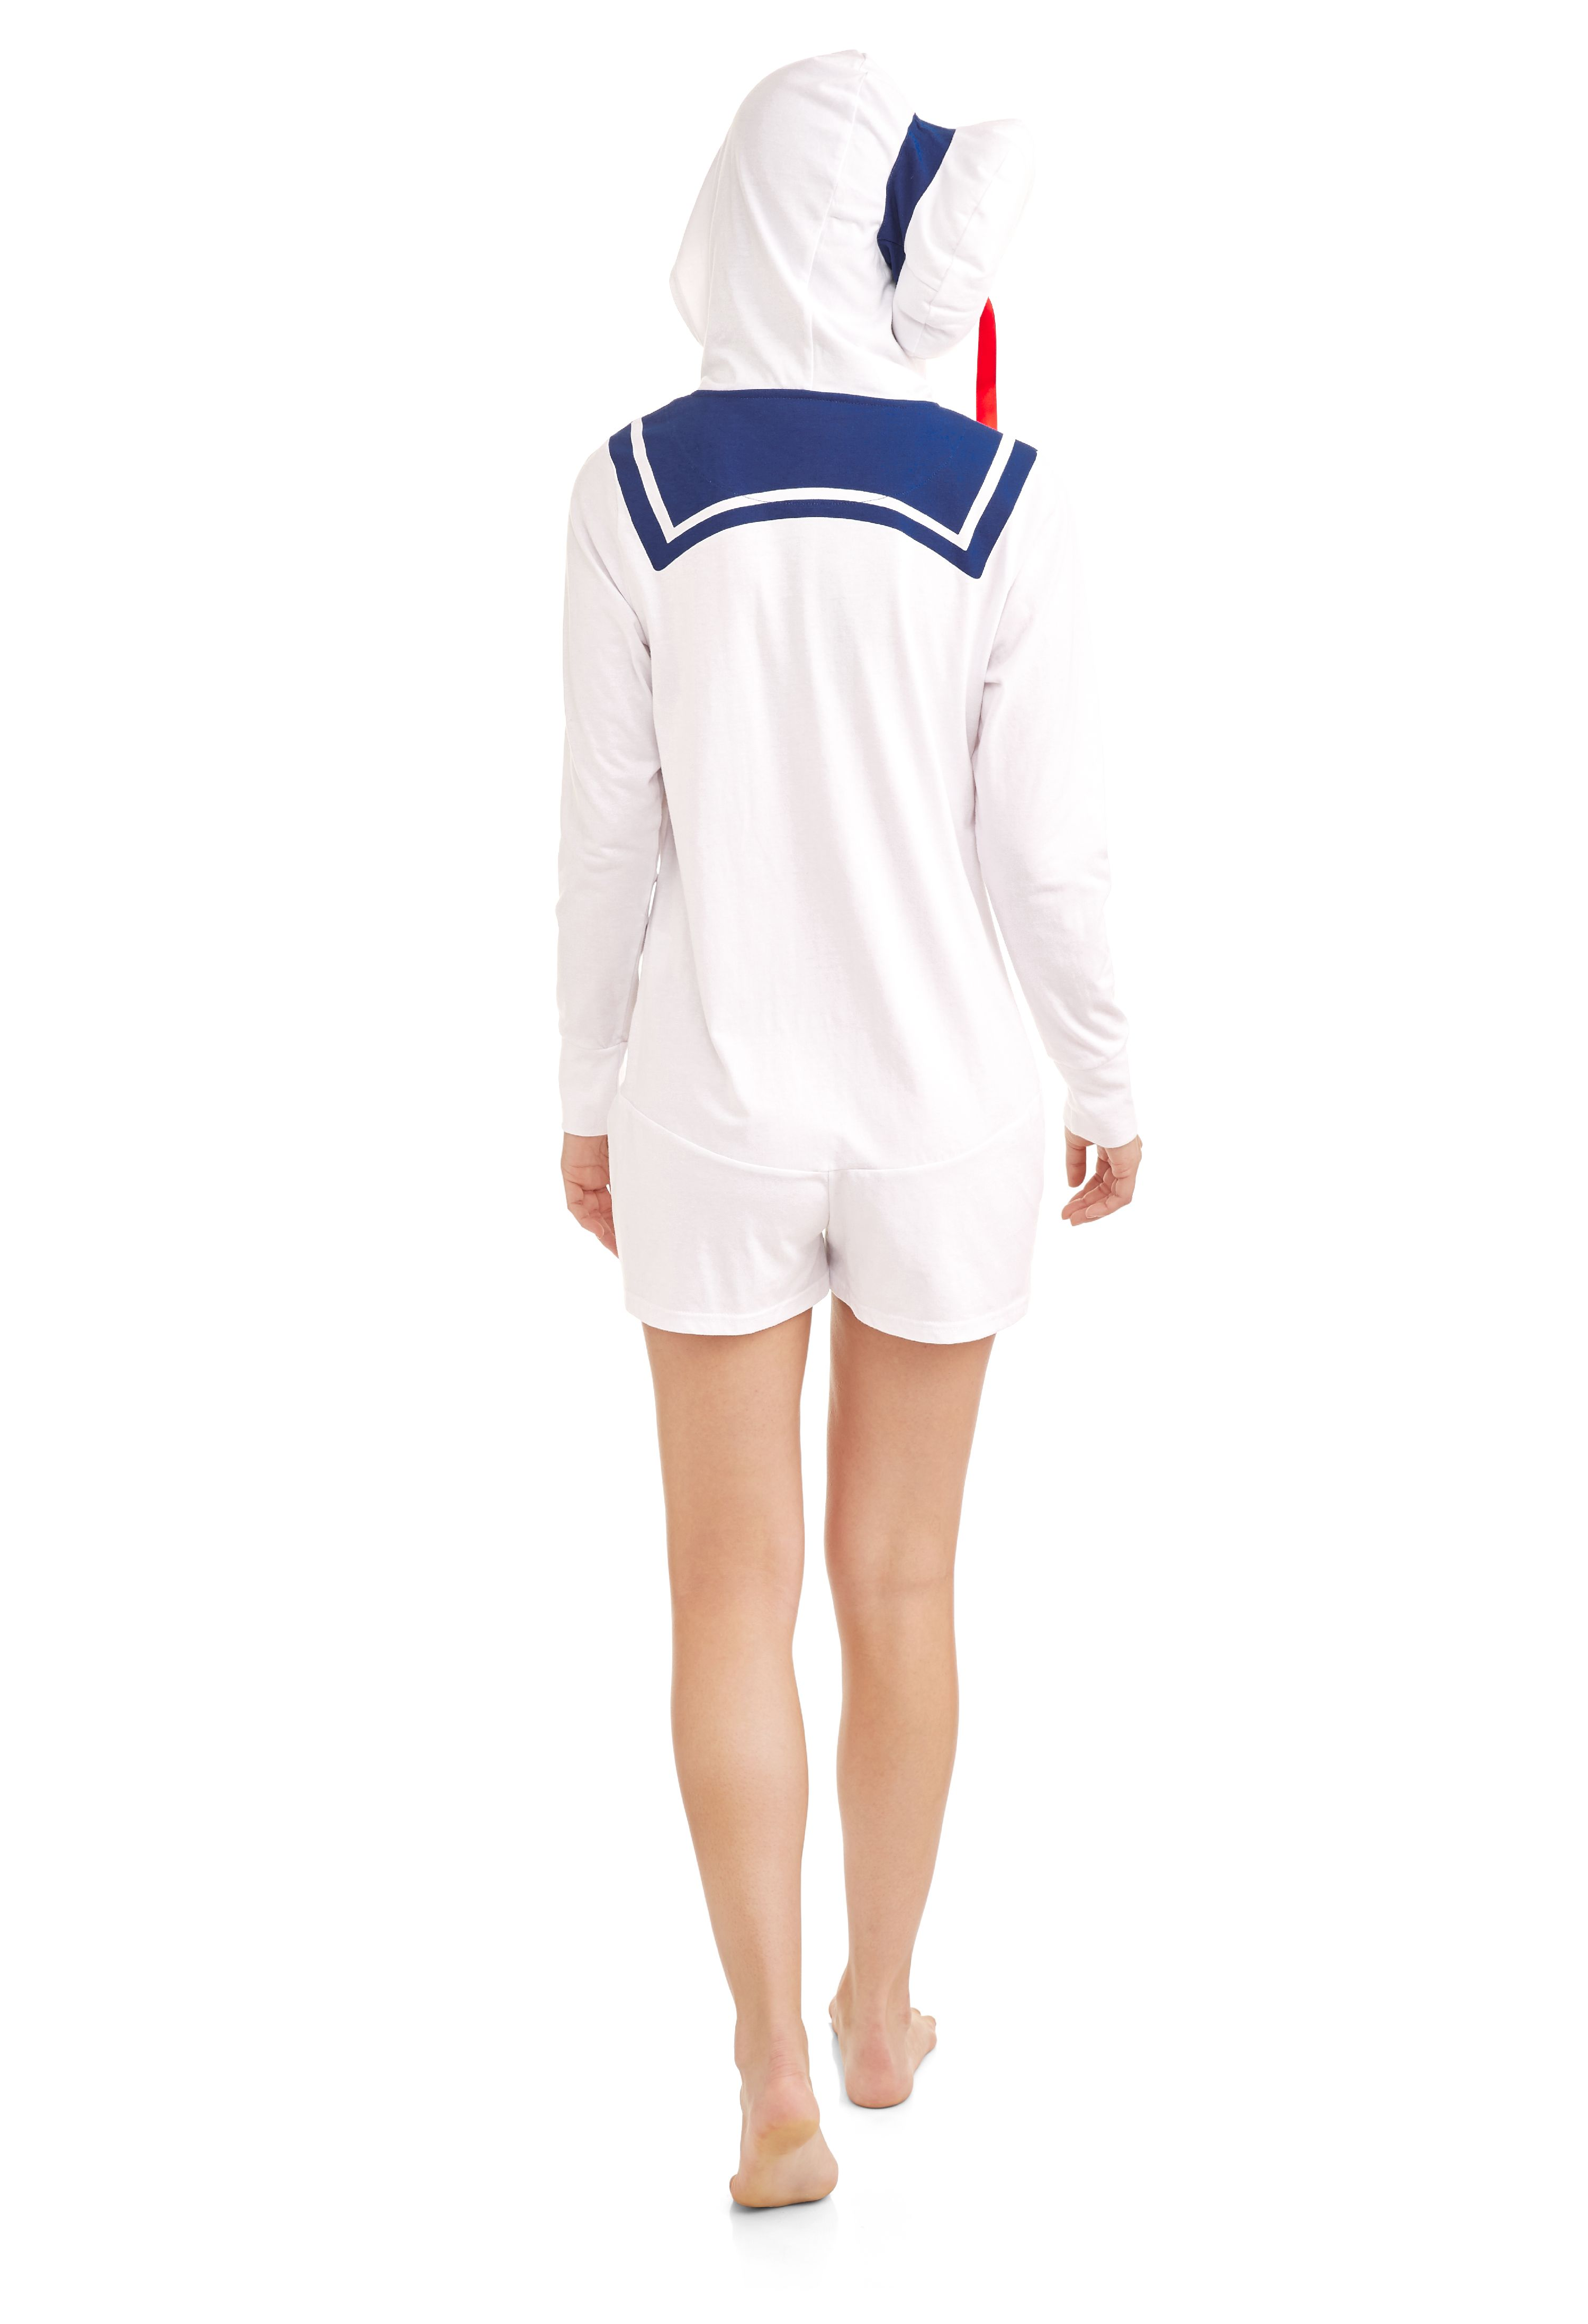 3d248d6c6d4 License - Ghostbusters Stay Puff Marshmallow Women s Sleepwear Adult  Costume Rompers - Walmart.com